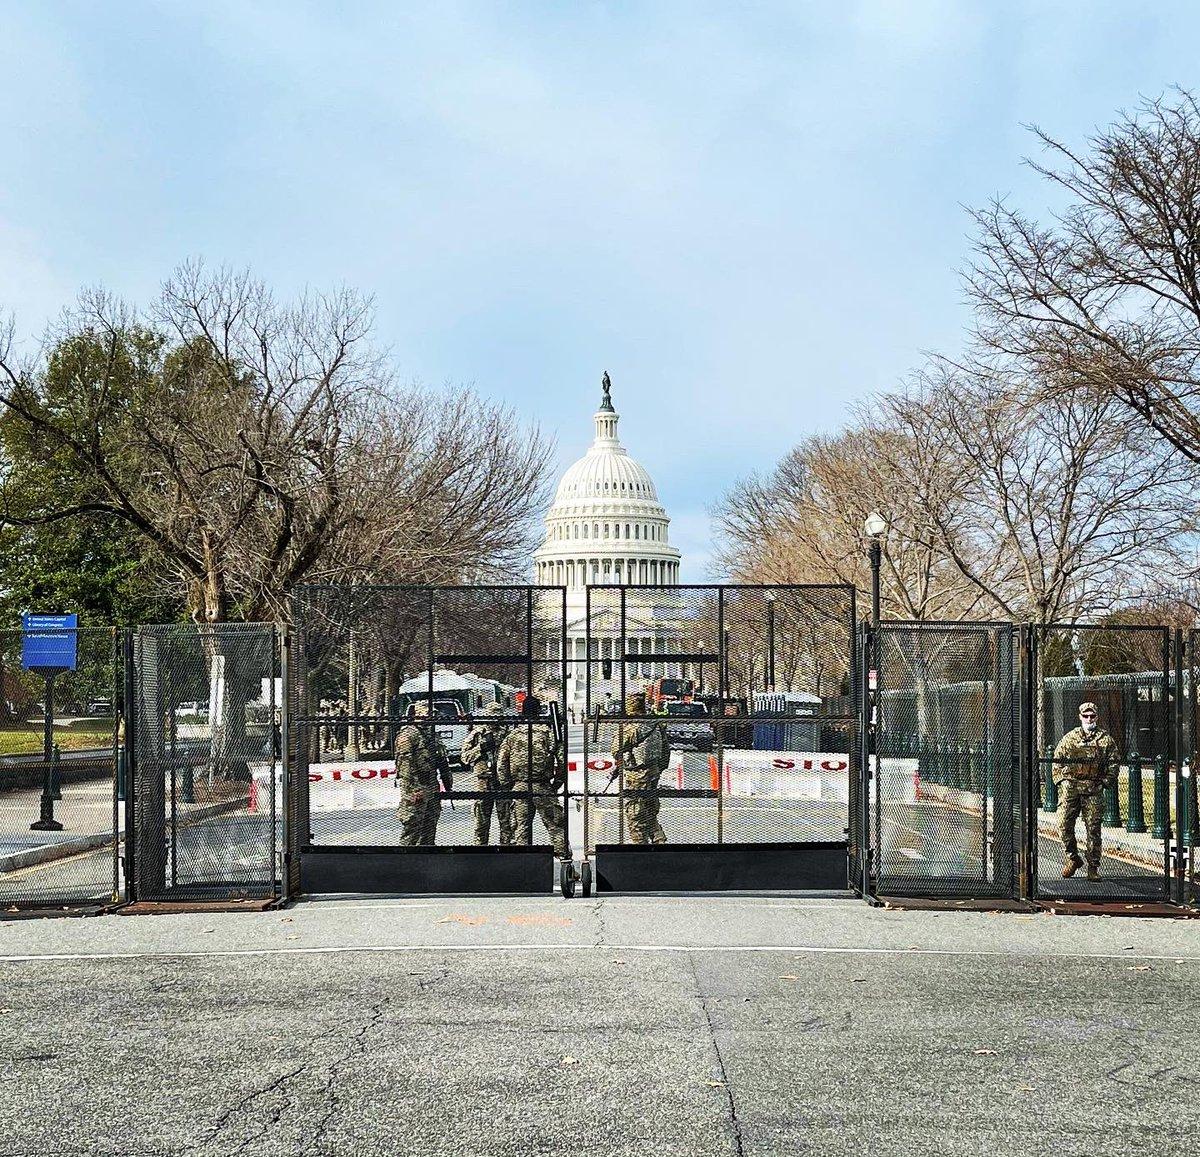 Just a walk around the neighborhood. 🇺🇸#inauguration #inauguration2021 #InaugurationSecurity #capitol #CapitolHill